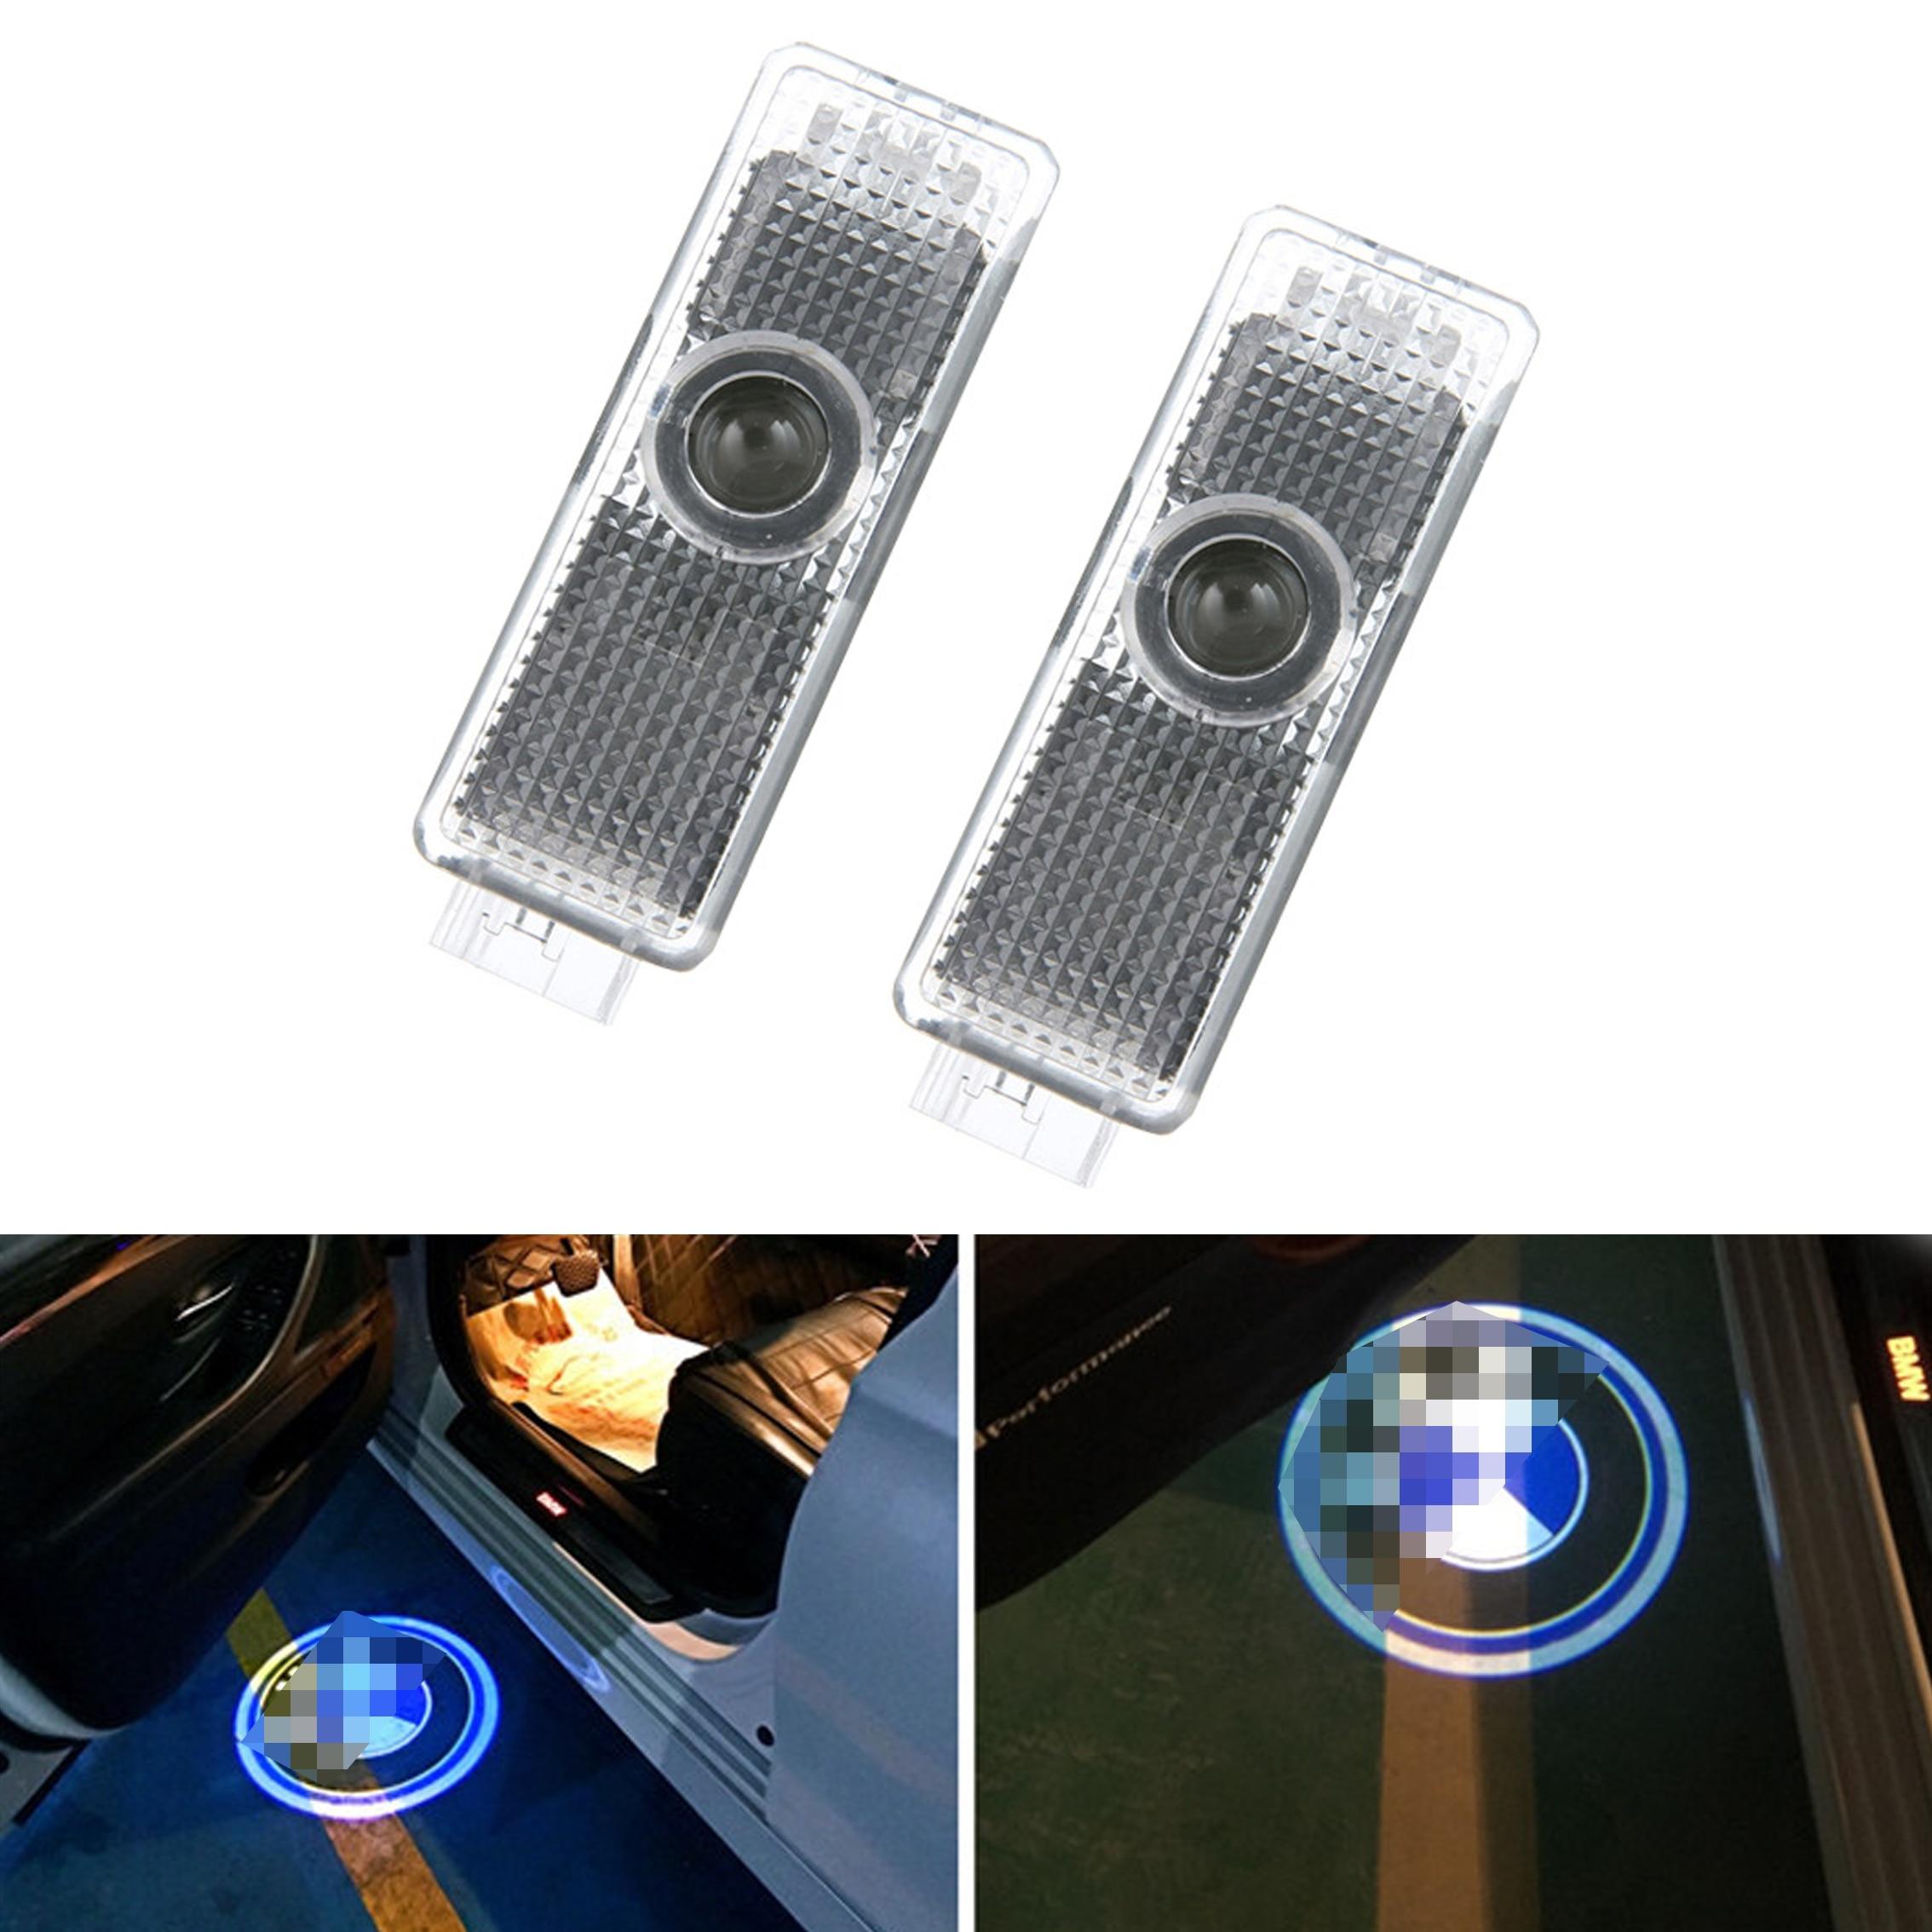 1X Car-styling For BMW E53 X5 E39 X3 E46 Car Door Light Welcome Light LED Laser Projector Lamp For BMW LOGO Decorative Lamp